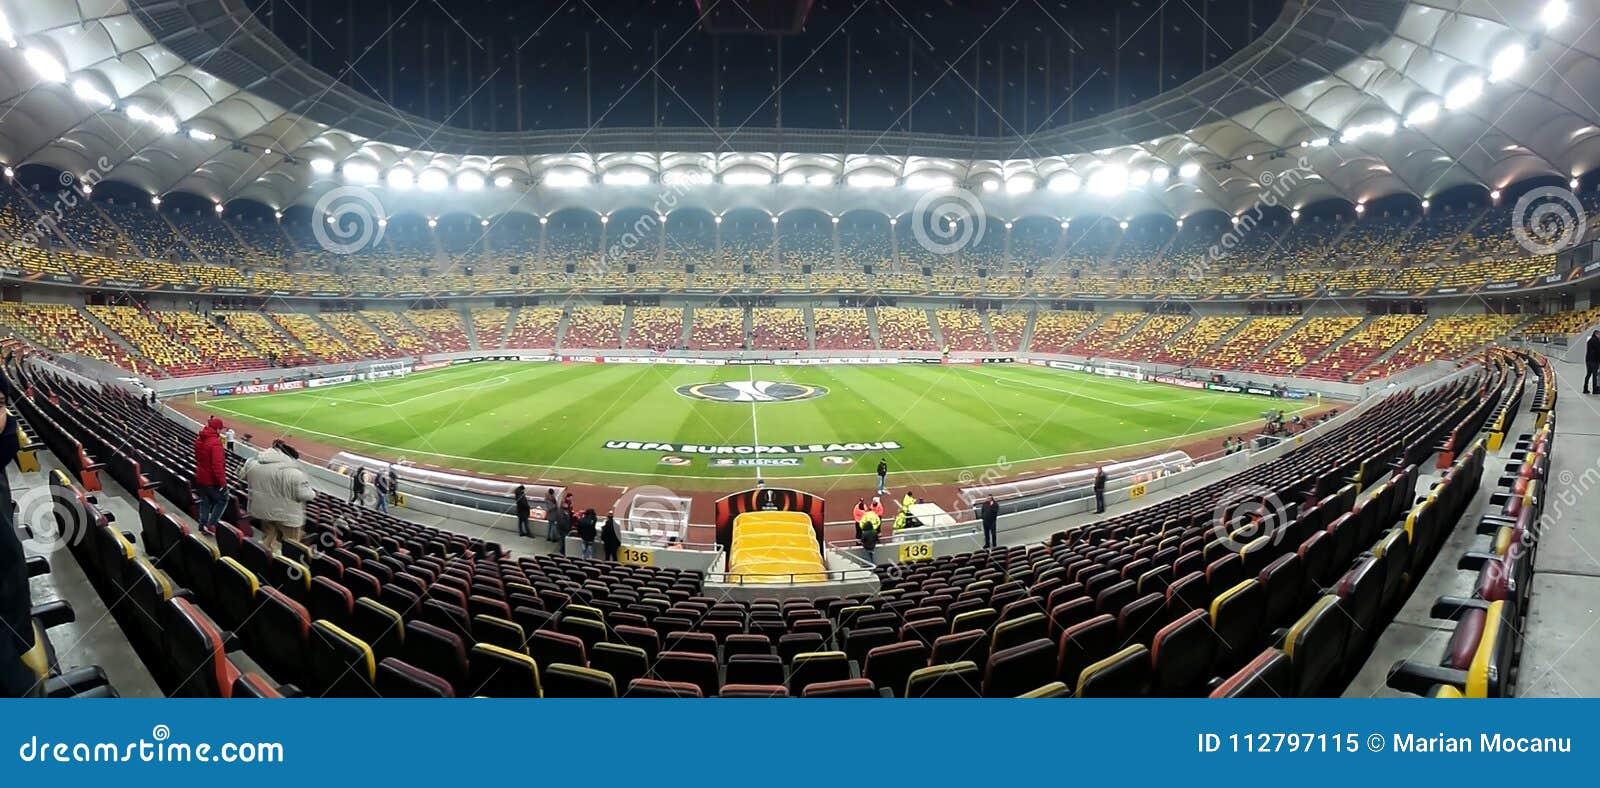 Football stadium, ready for Champions League